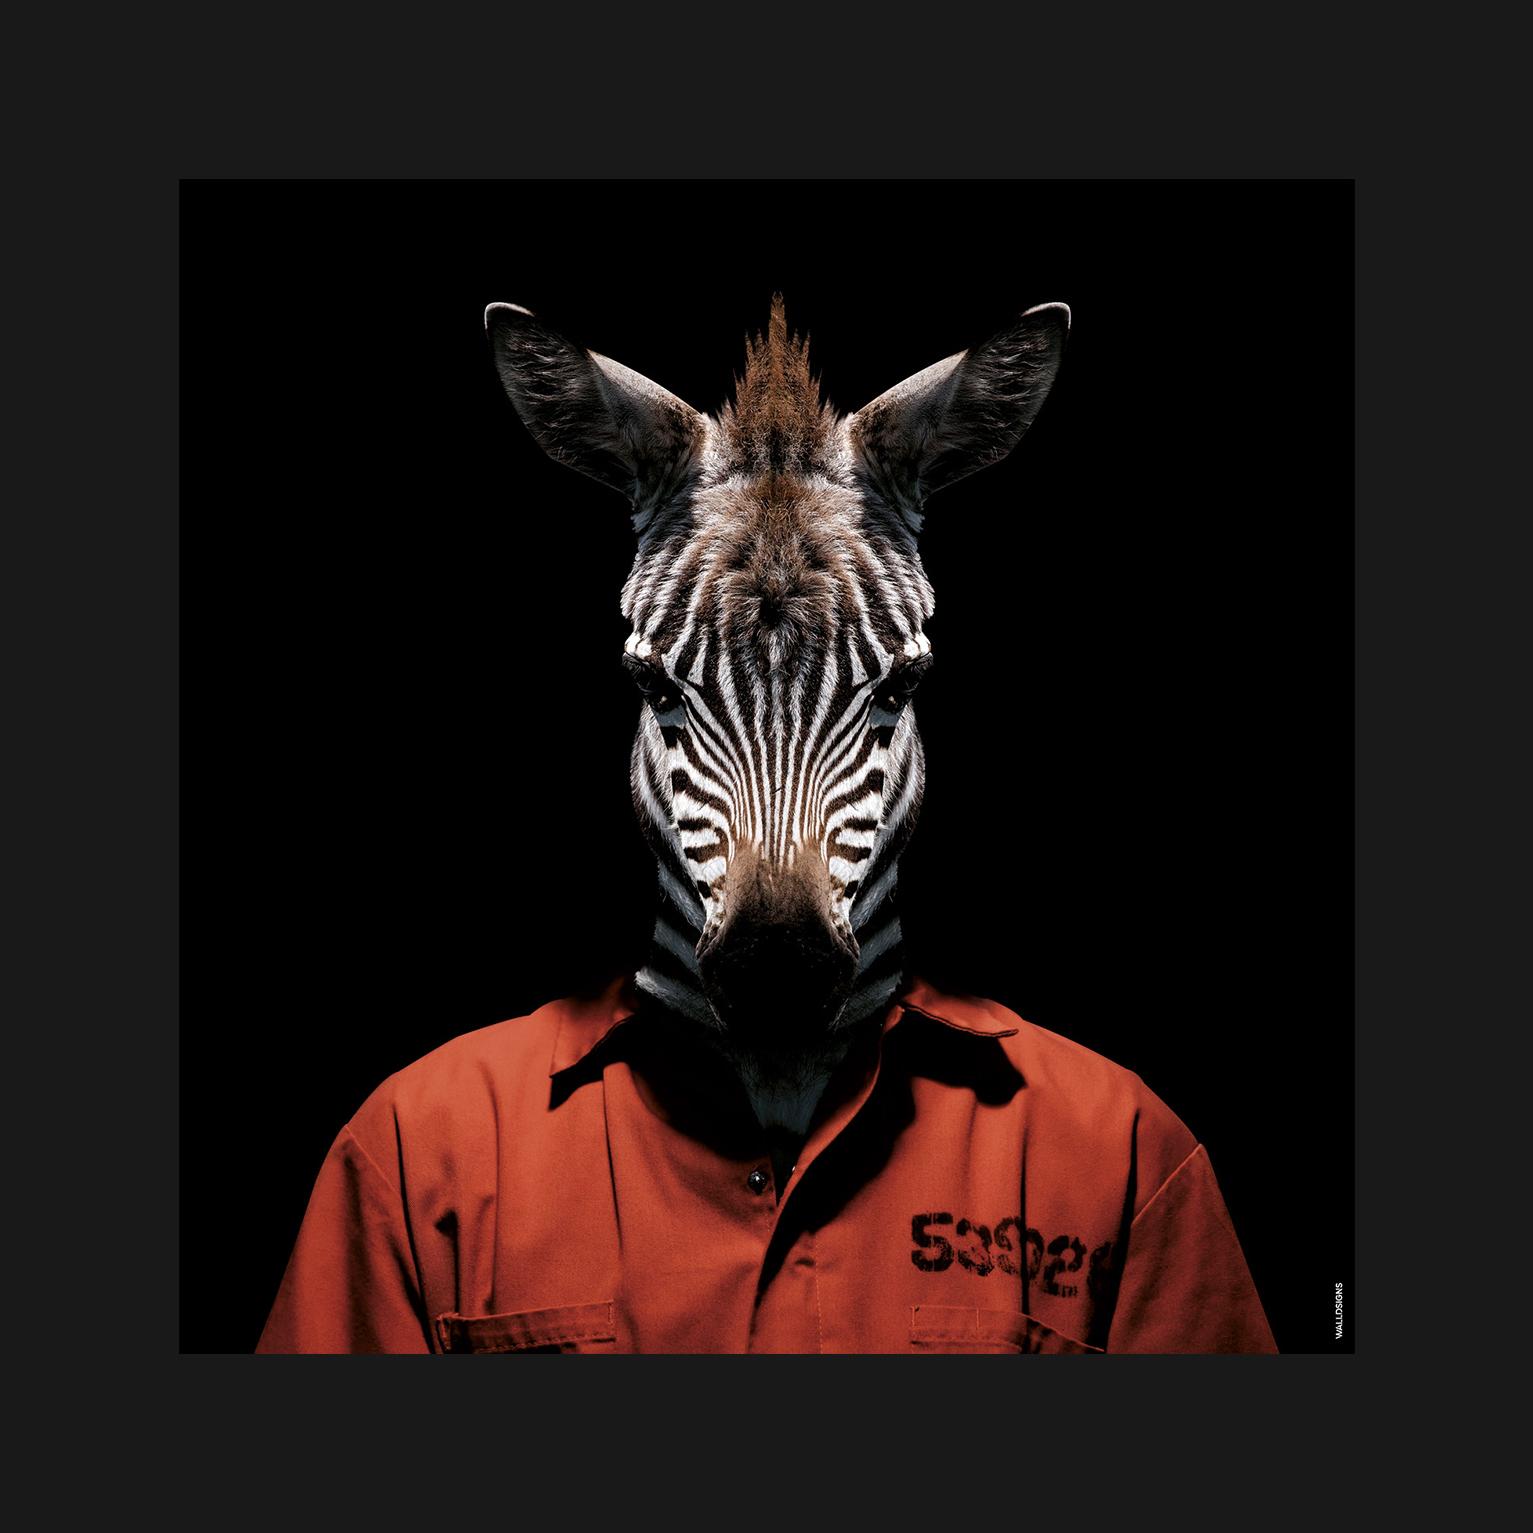 Prison Animal Zebra   Walldsigns